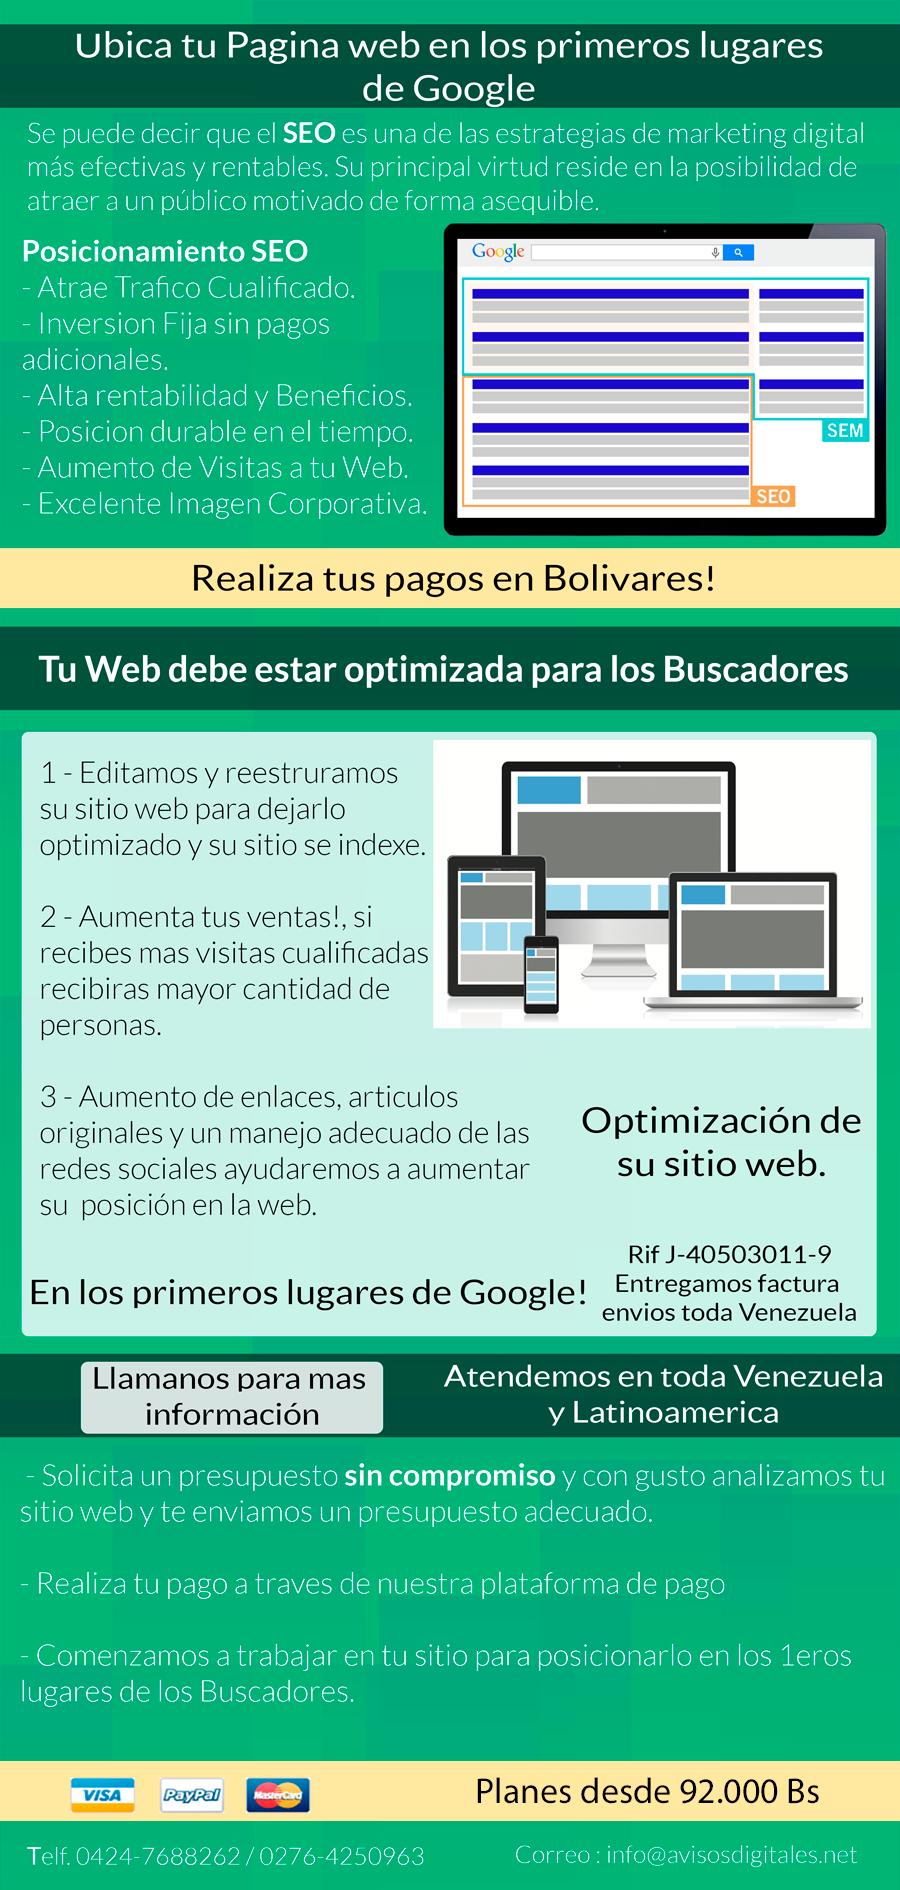 Avisos Digitales - Facebook Ads